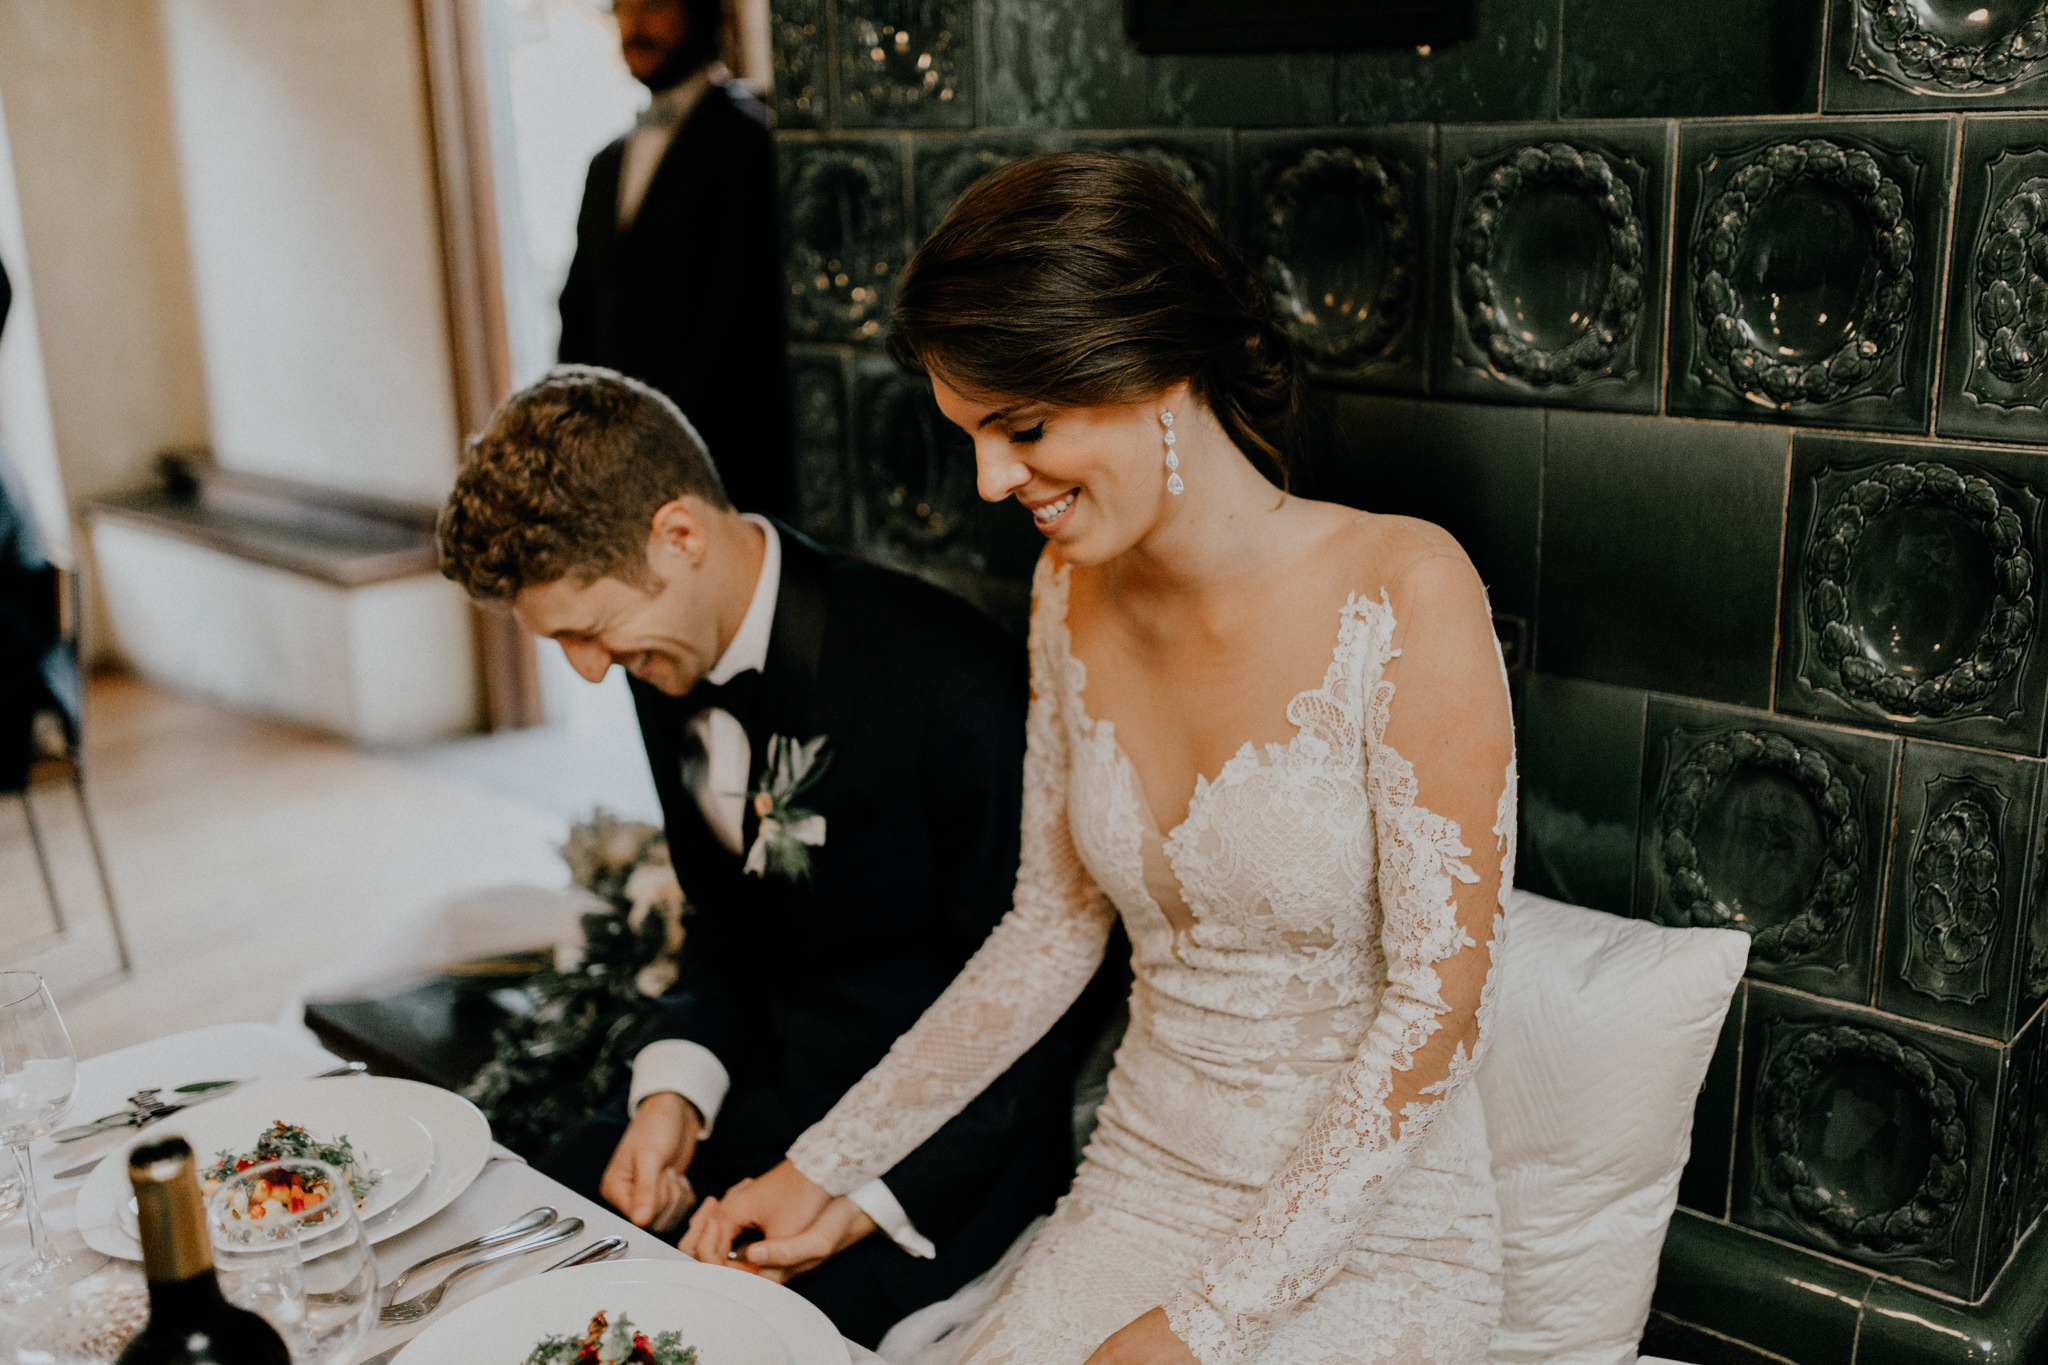 wedding-headlands-center-for-the-arts-sausalito-110.jpg